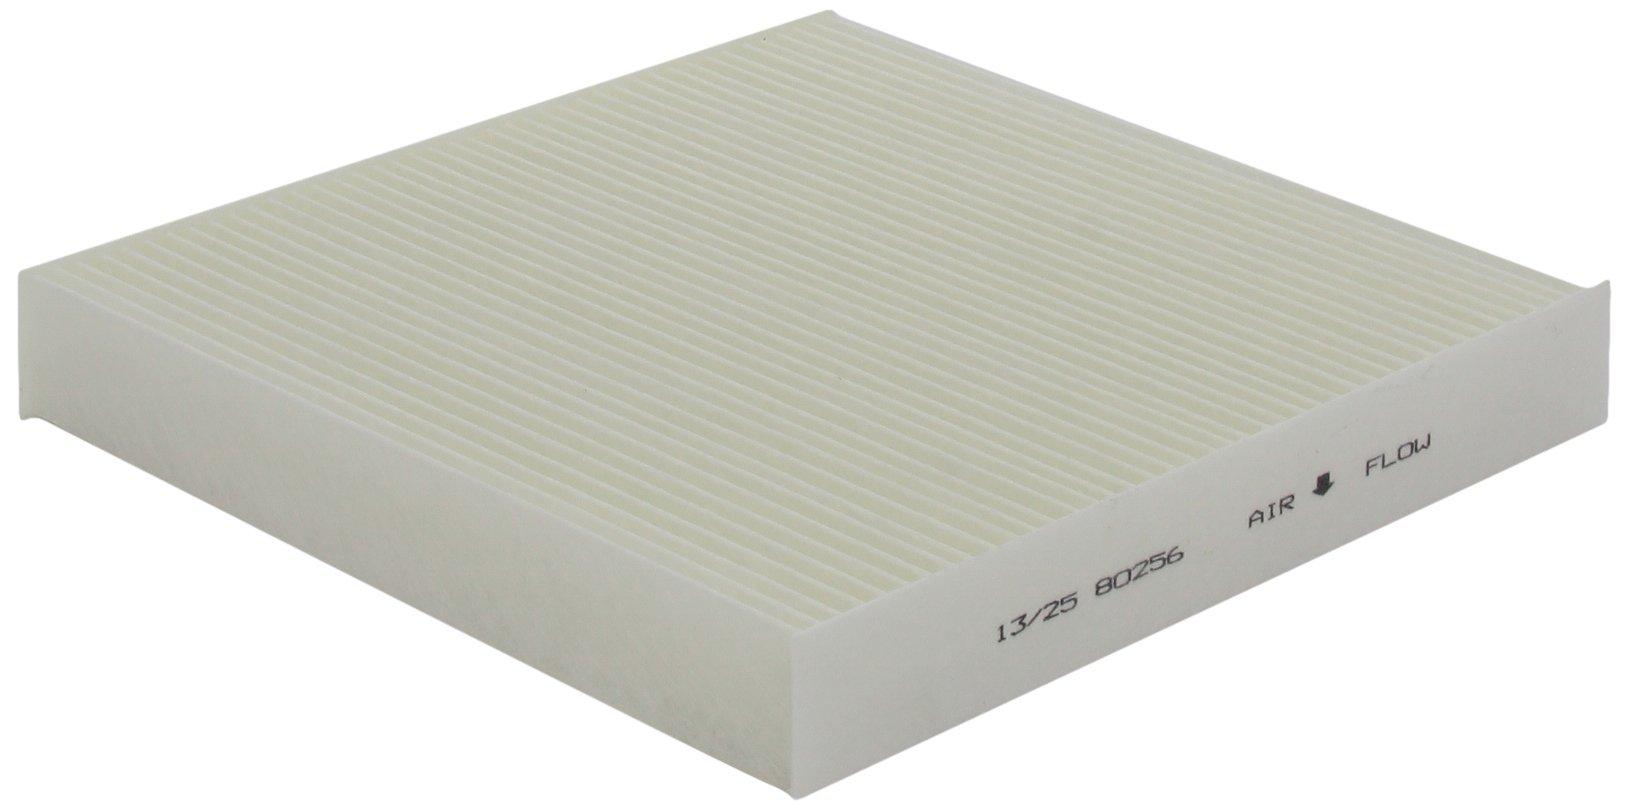 Blue Print ADH22271 Air Filter pack of one